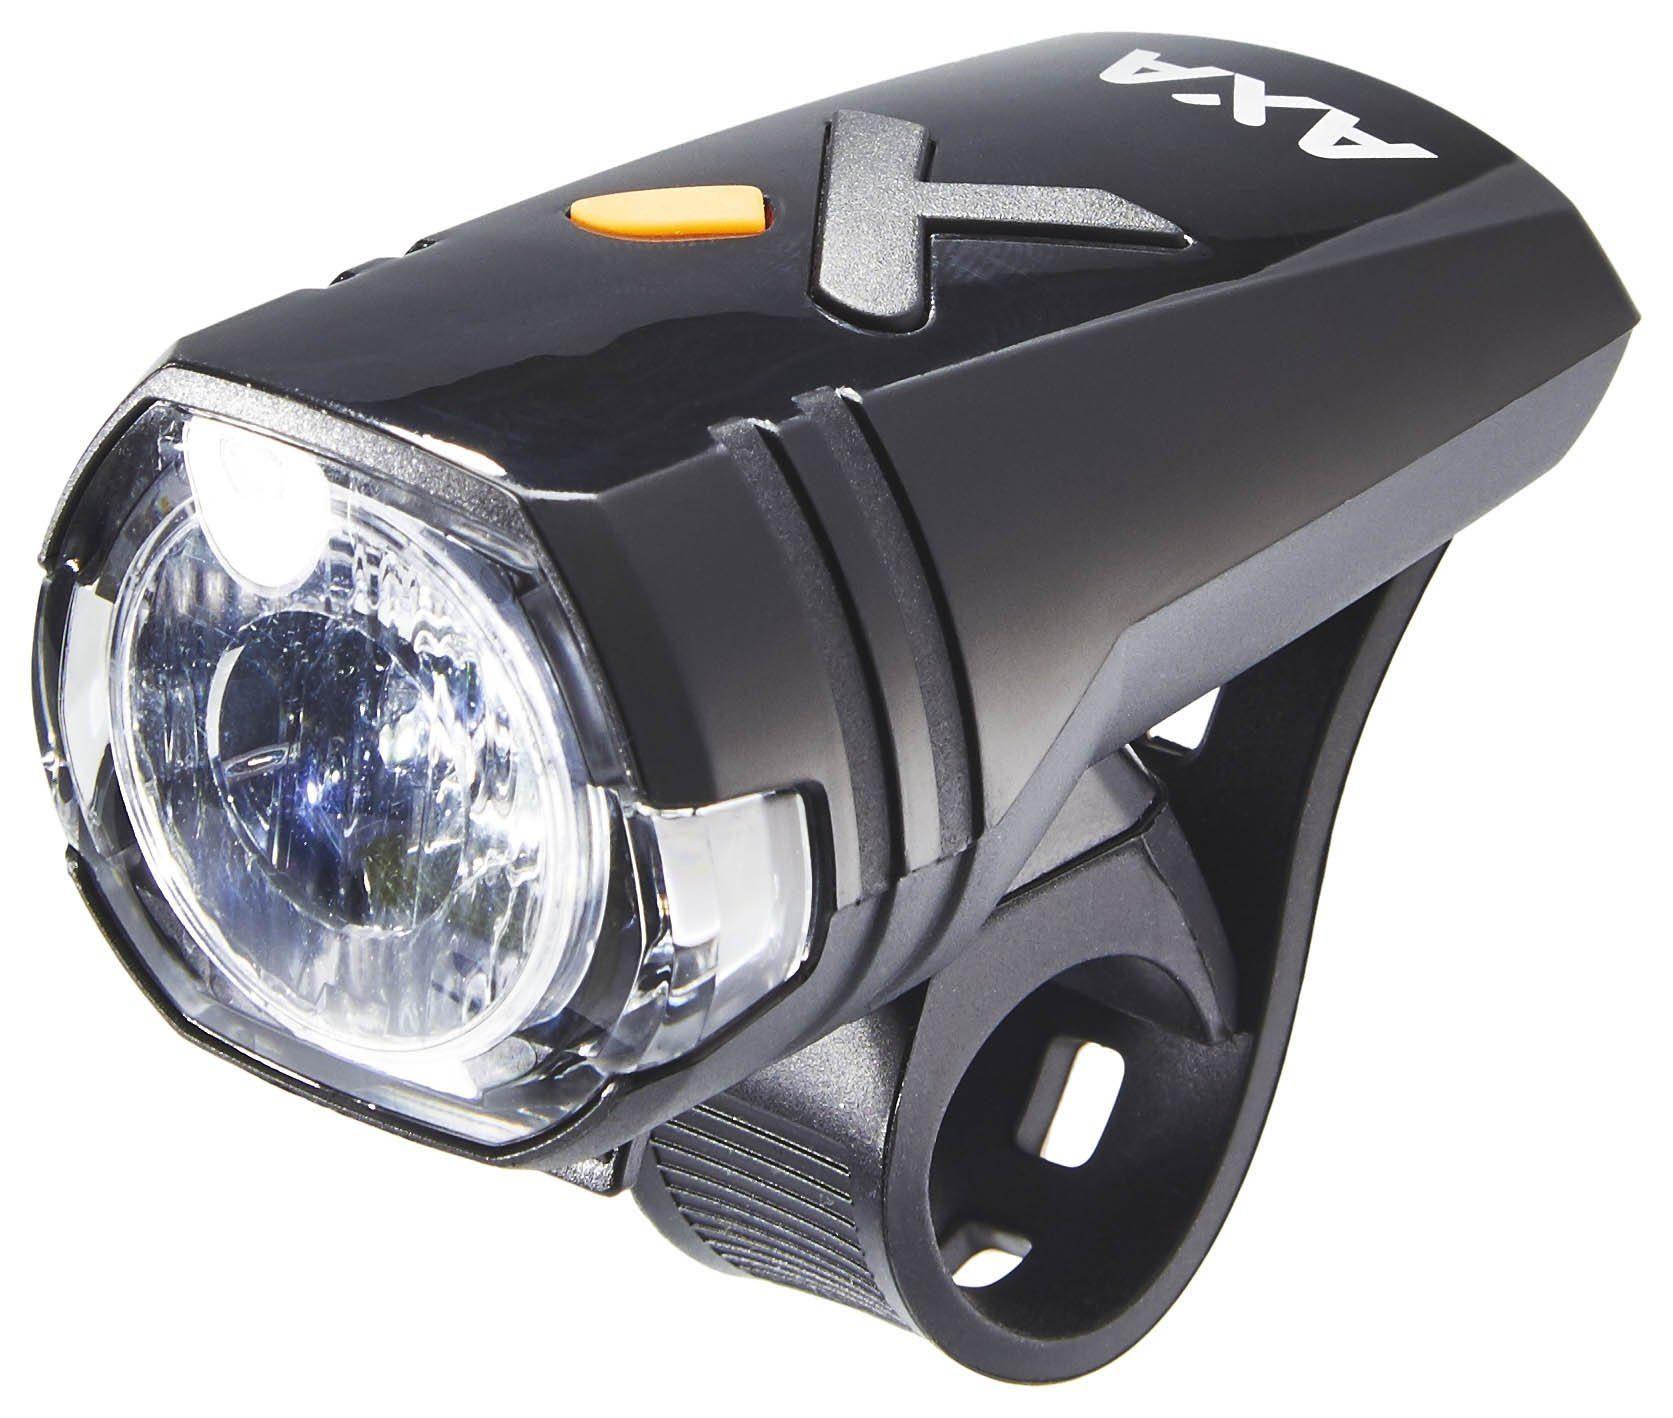 AXA Fahrradbeleuchtung »Greenline30 LED-Akkuscheinwerfer«